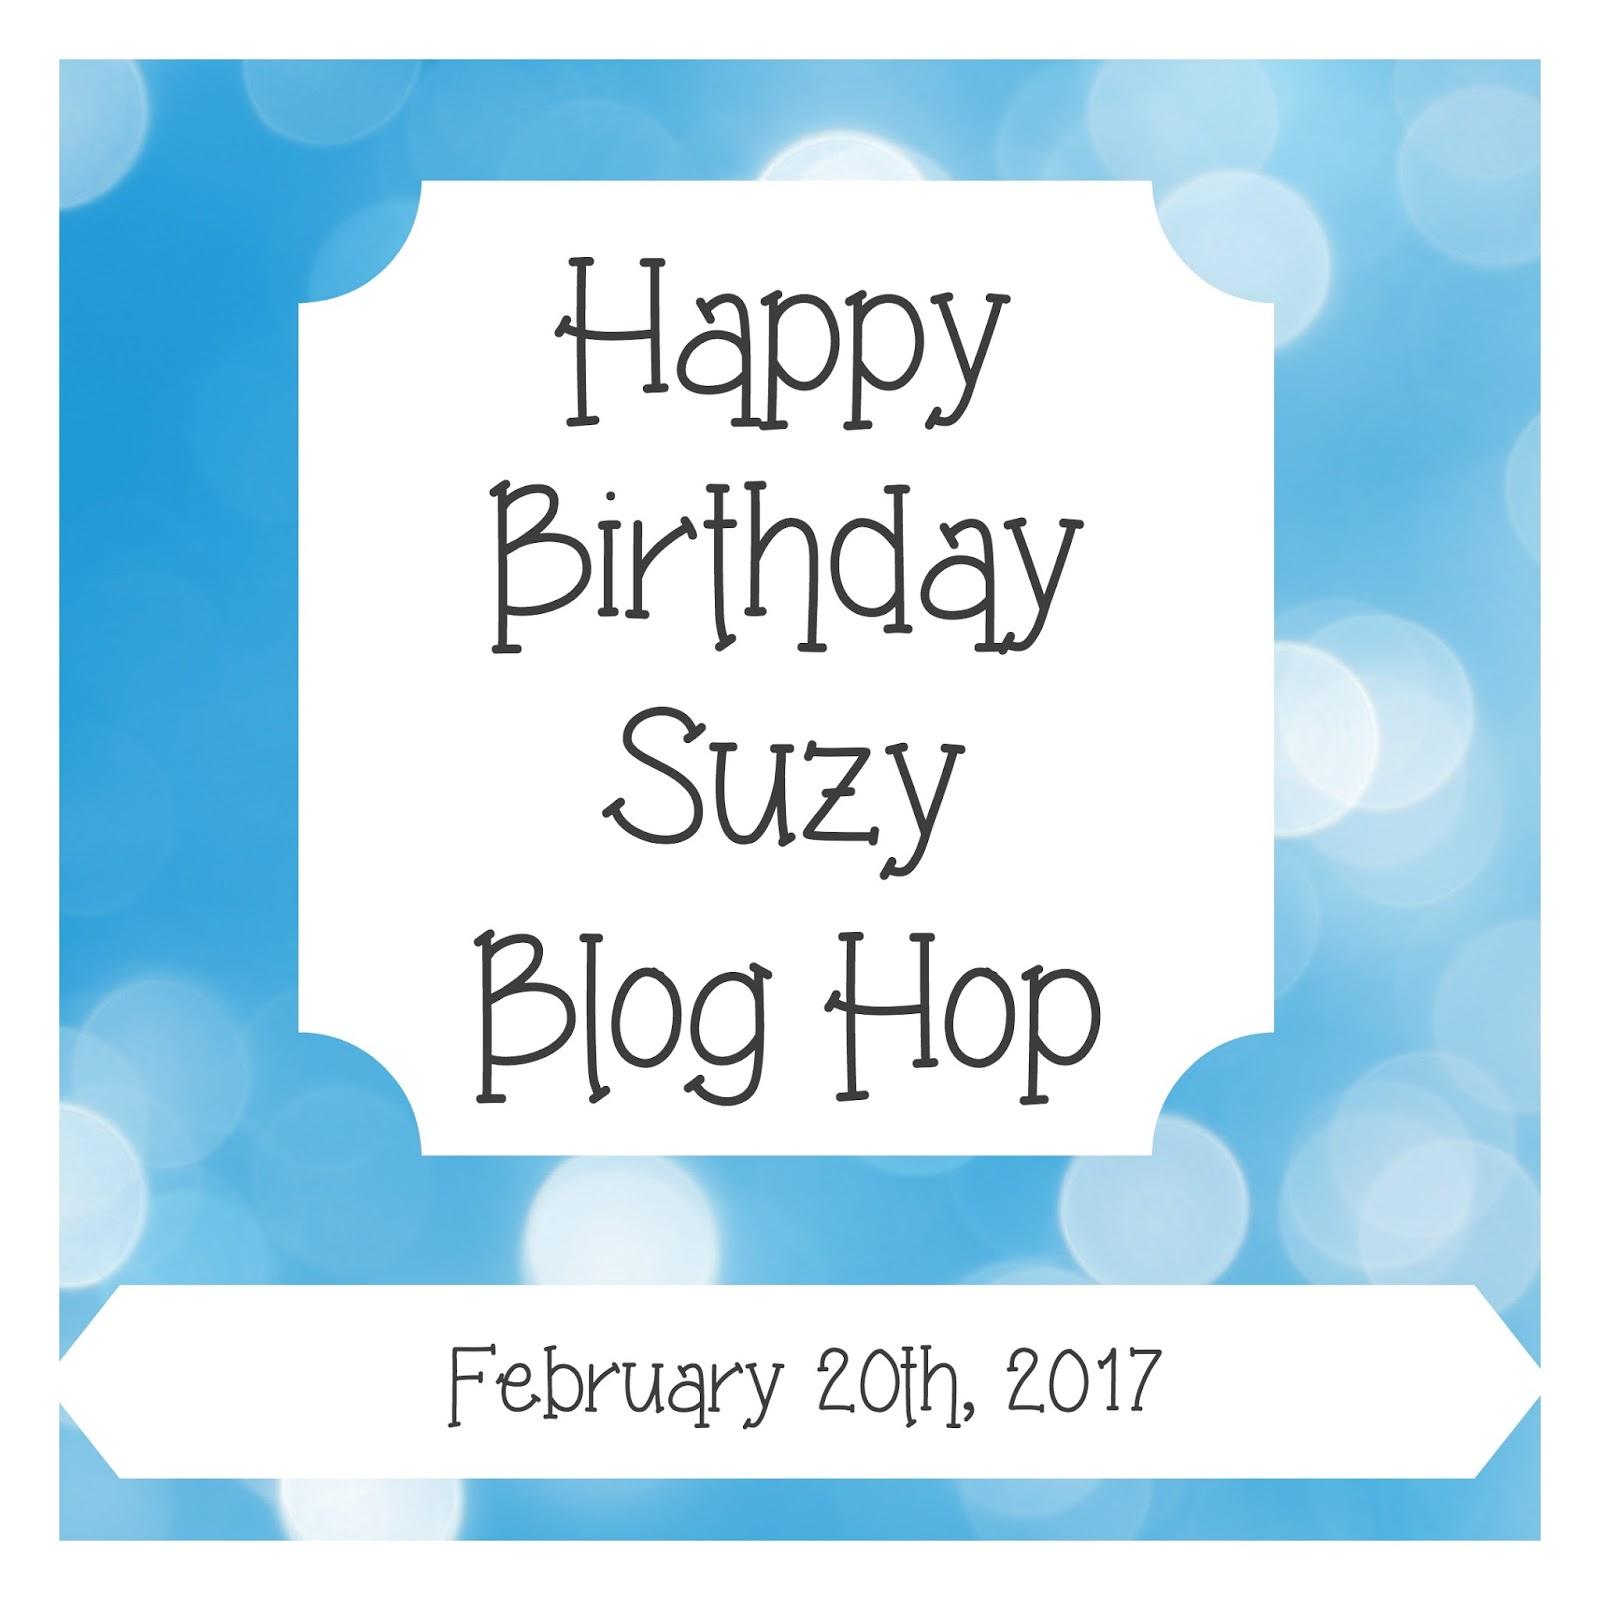 Live Laugh Scrap With Steph Ackerman: Happy Birthday Suzy